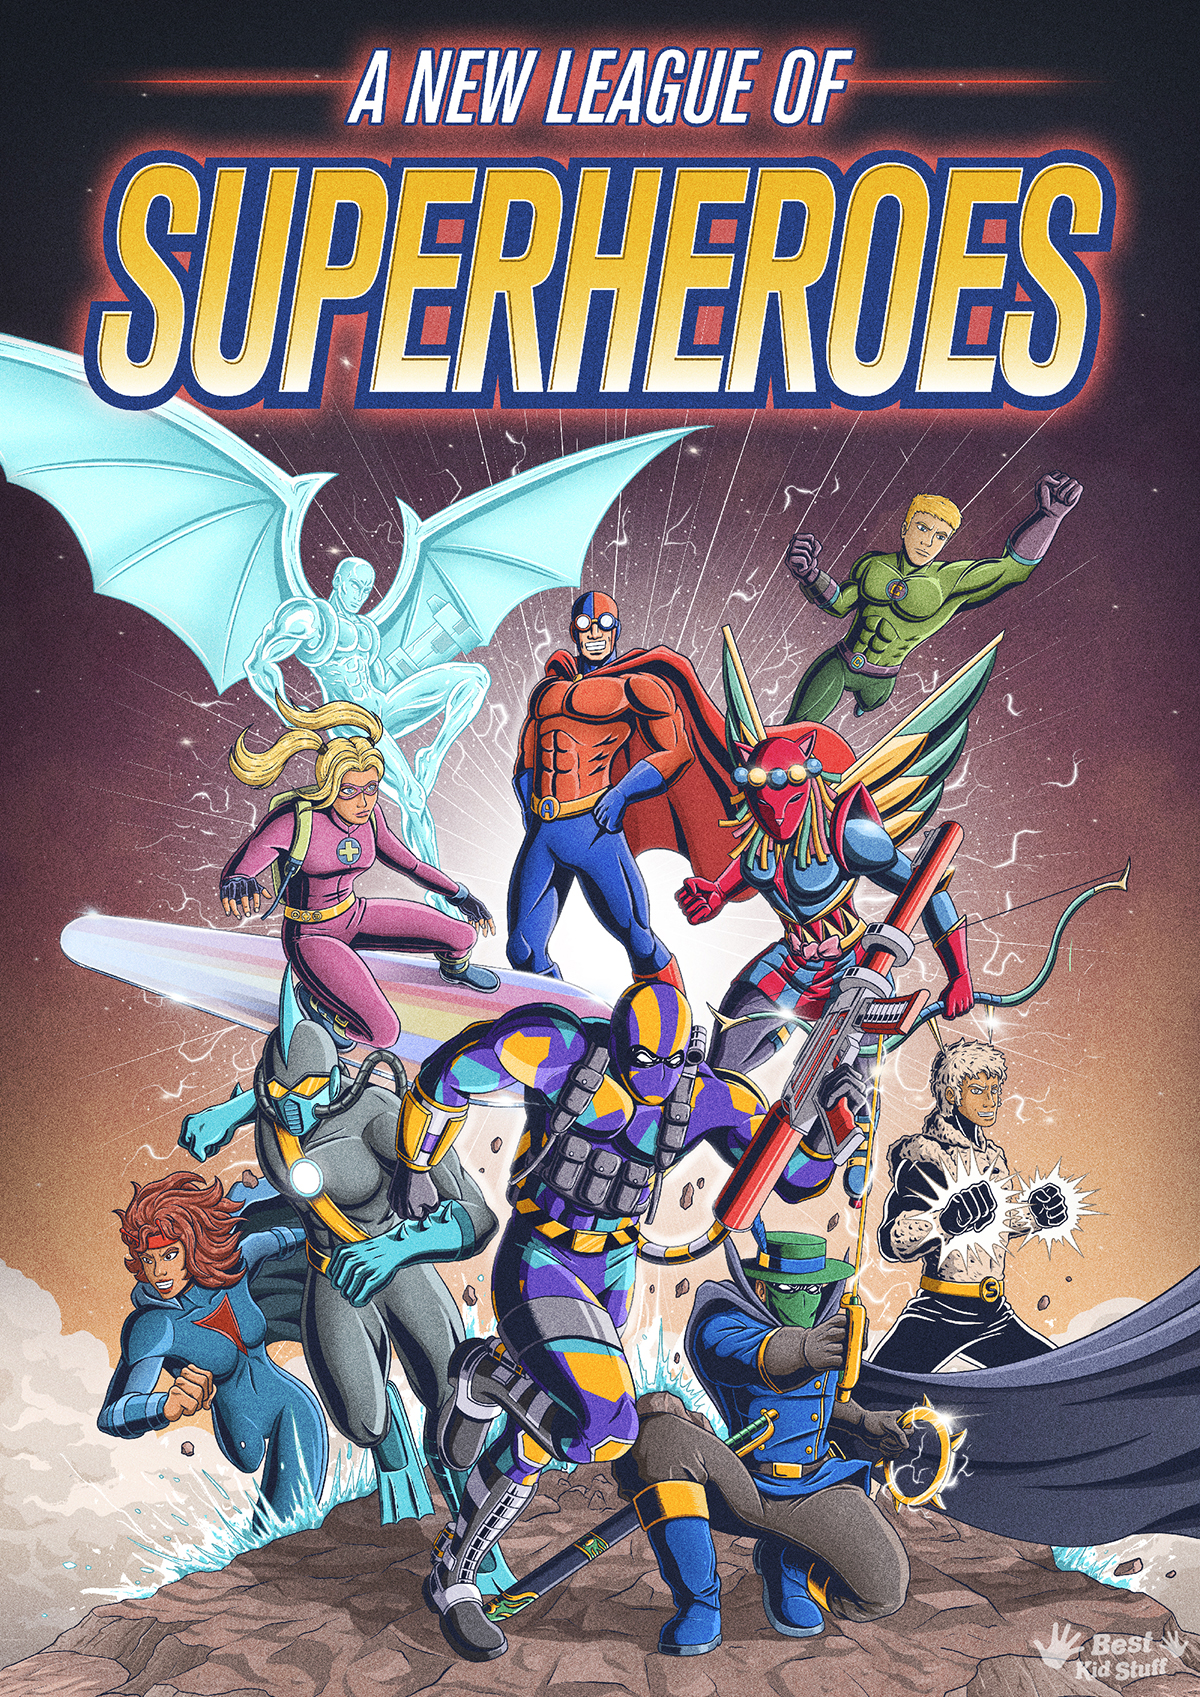 00 New League of Superheroes